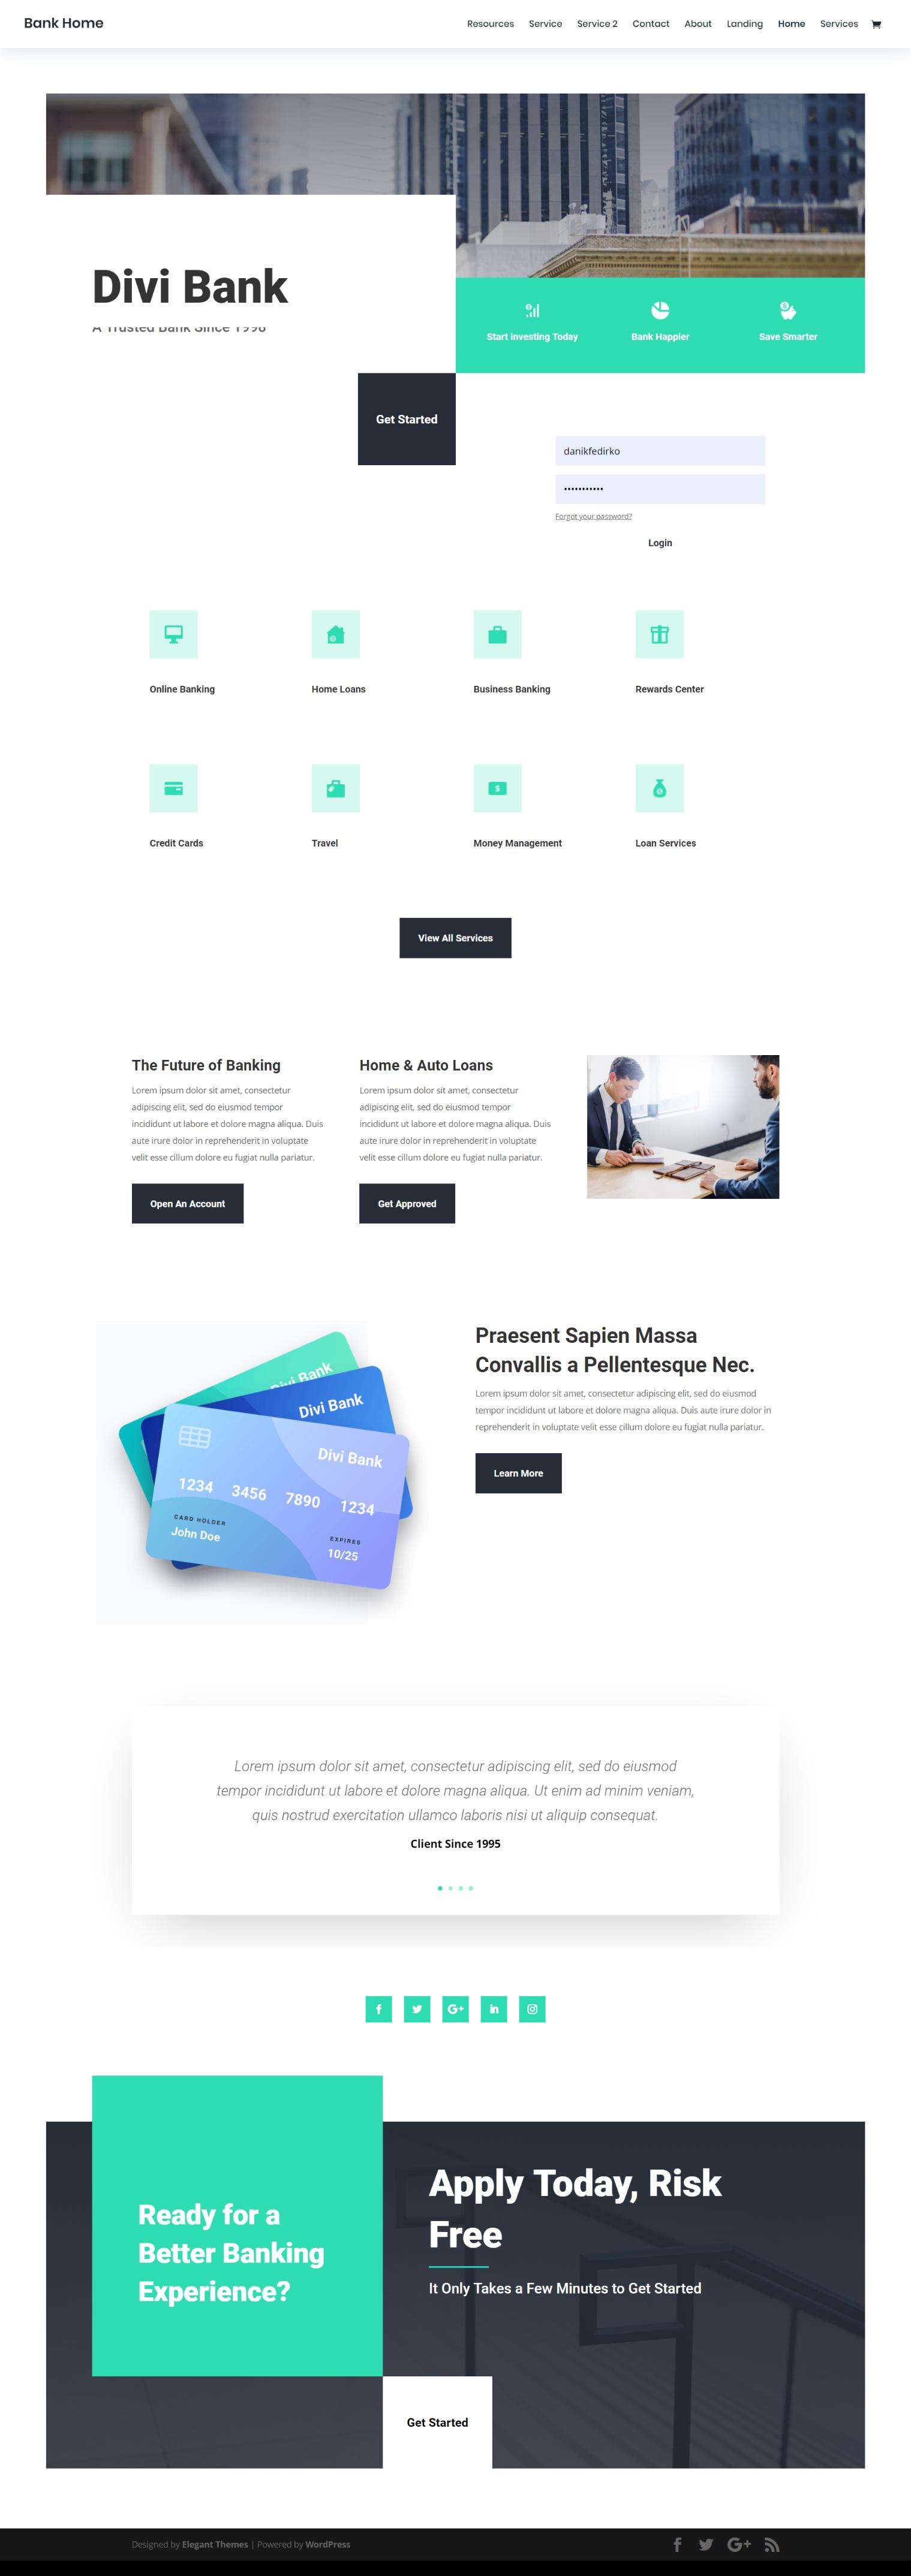 Clean Modern Online Banking Website Design Inspiration Ideas Best Wordpress Theme For Bank Clean Web Design Ecommerce Web Design Webpage Design Layout